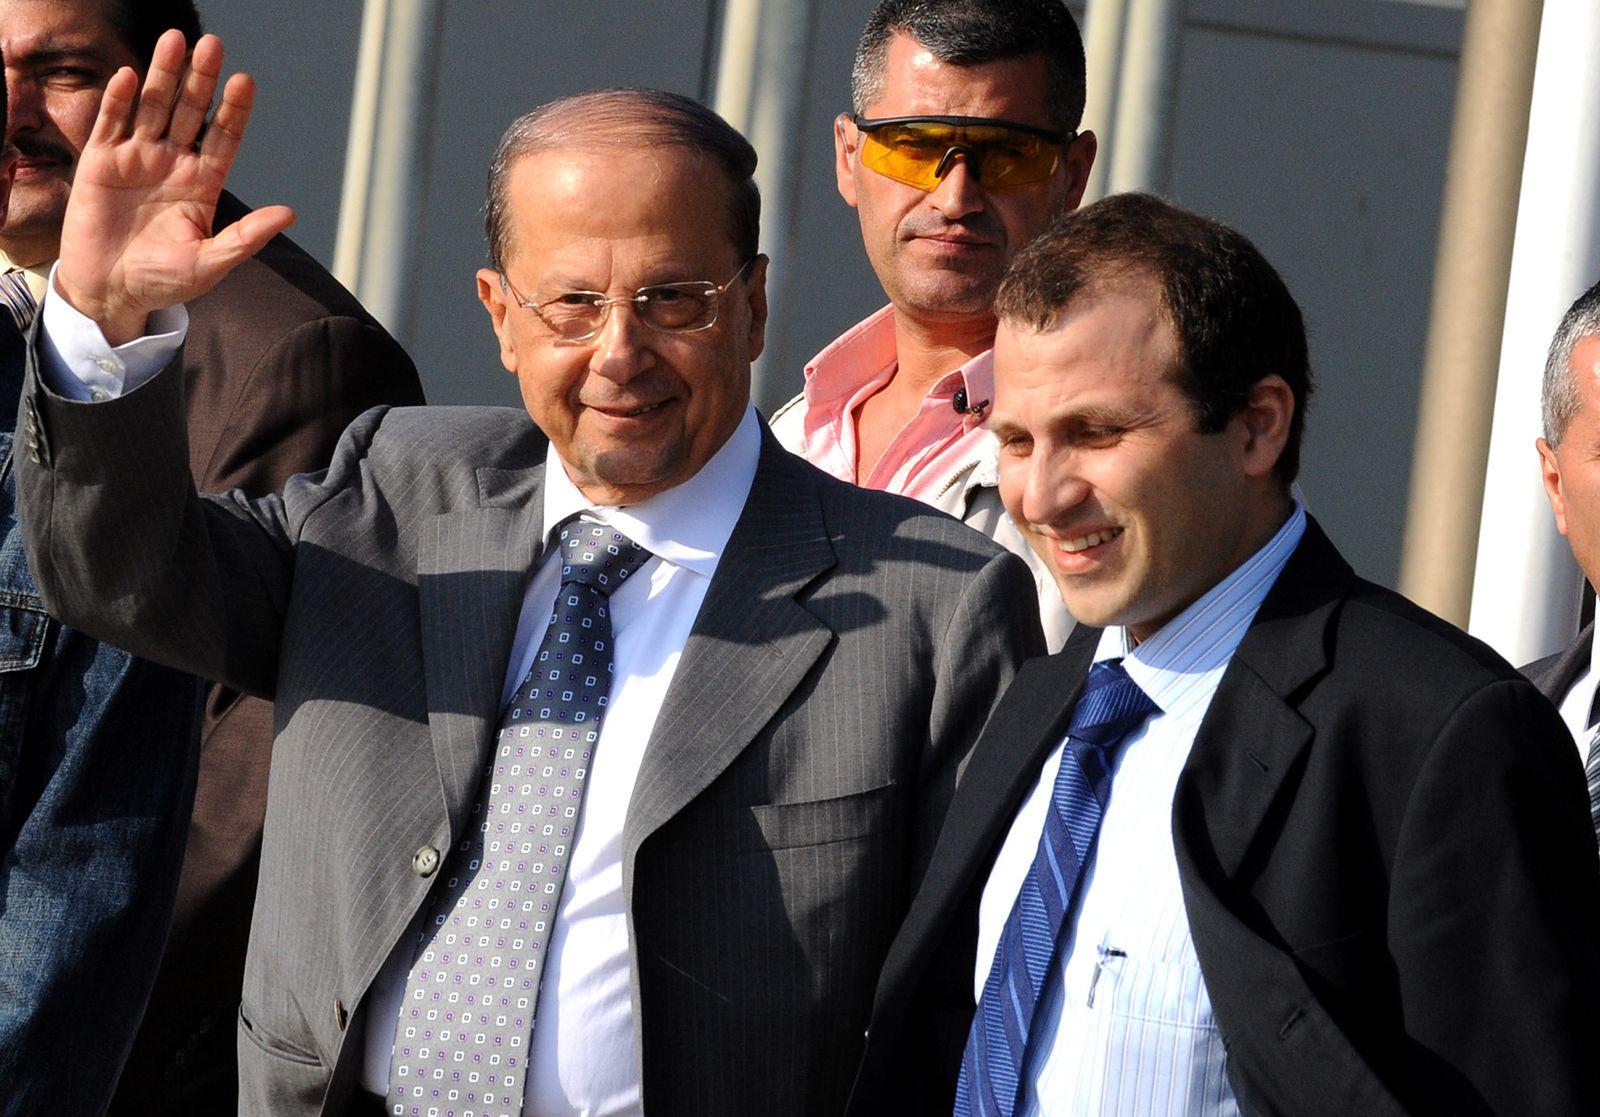 LEBANON-POLITICS-UNREST-QATAR